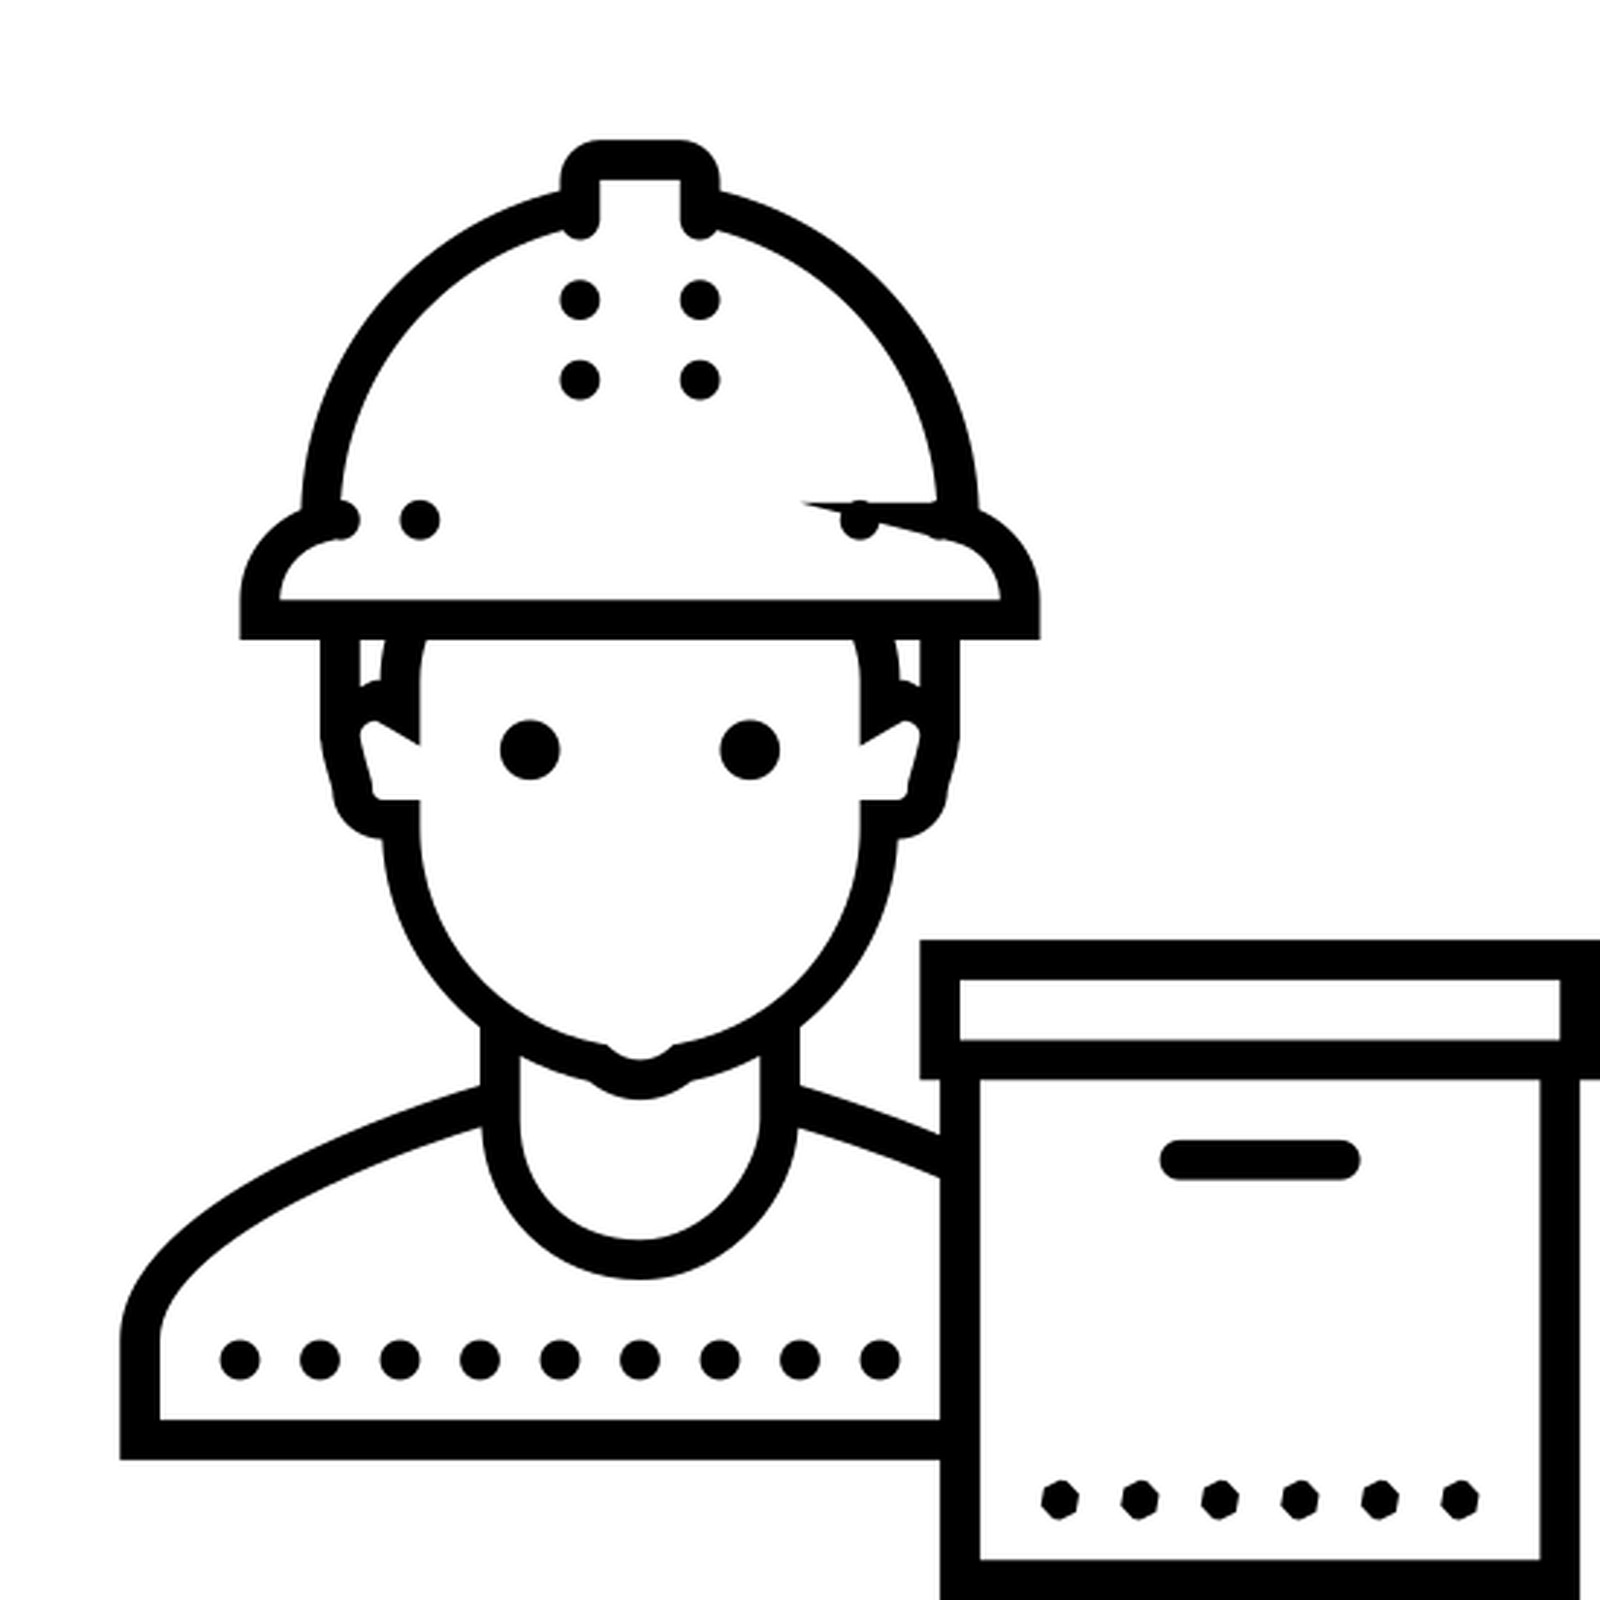 Fournisseur icon